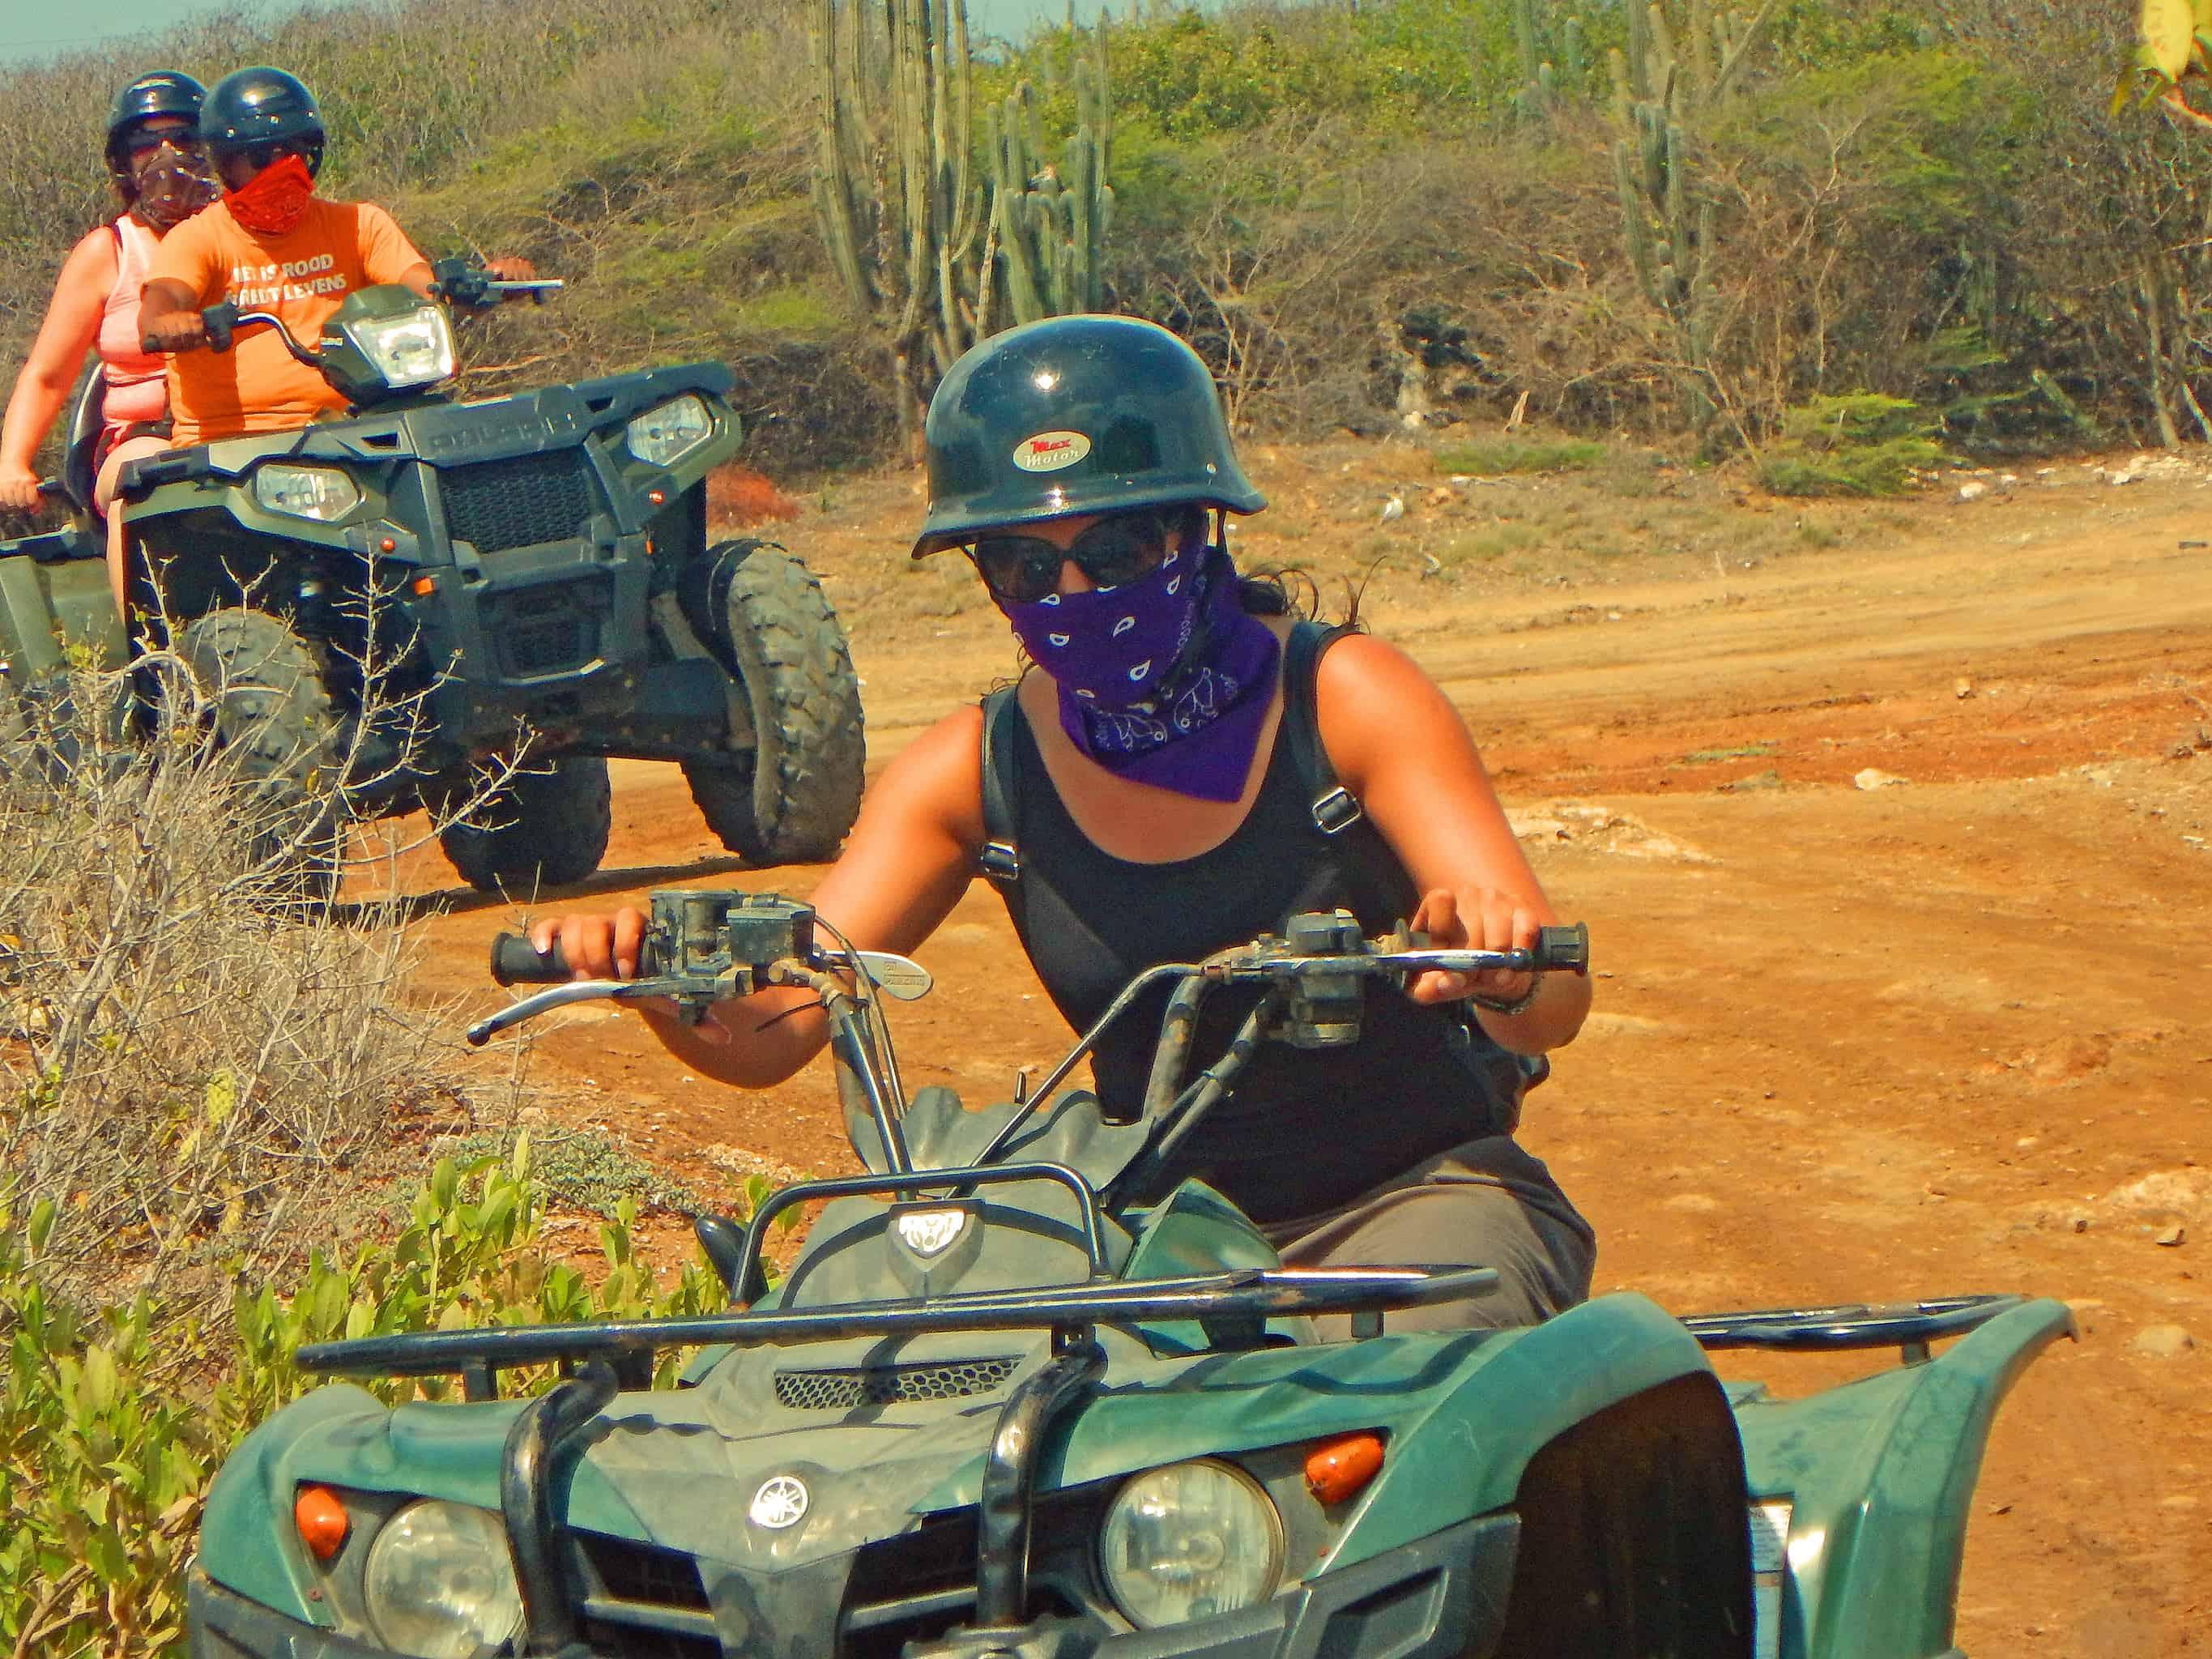 ATV Tours Quad Curacao Eric ATV 4 - Quad Todoterreno en Curaçao